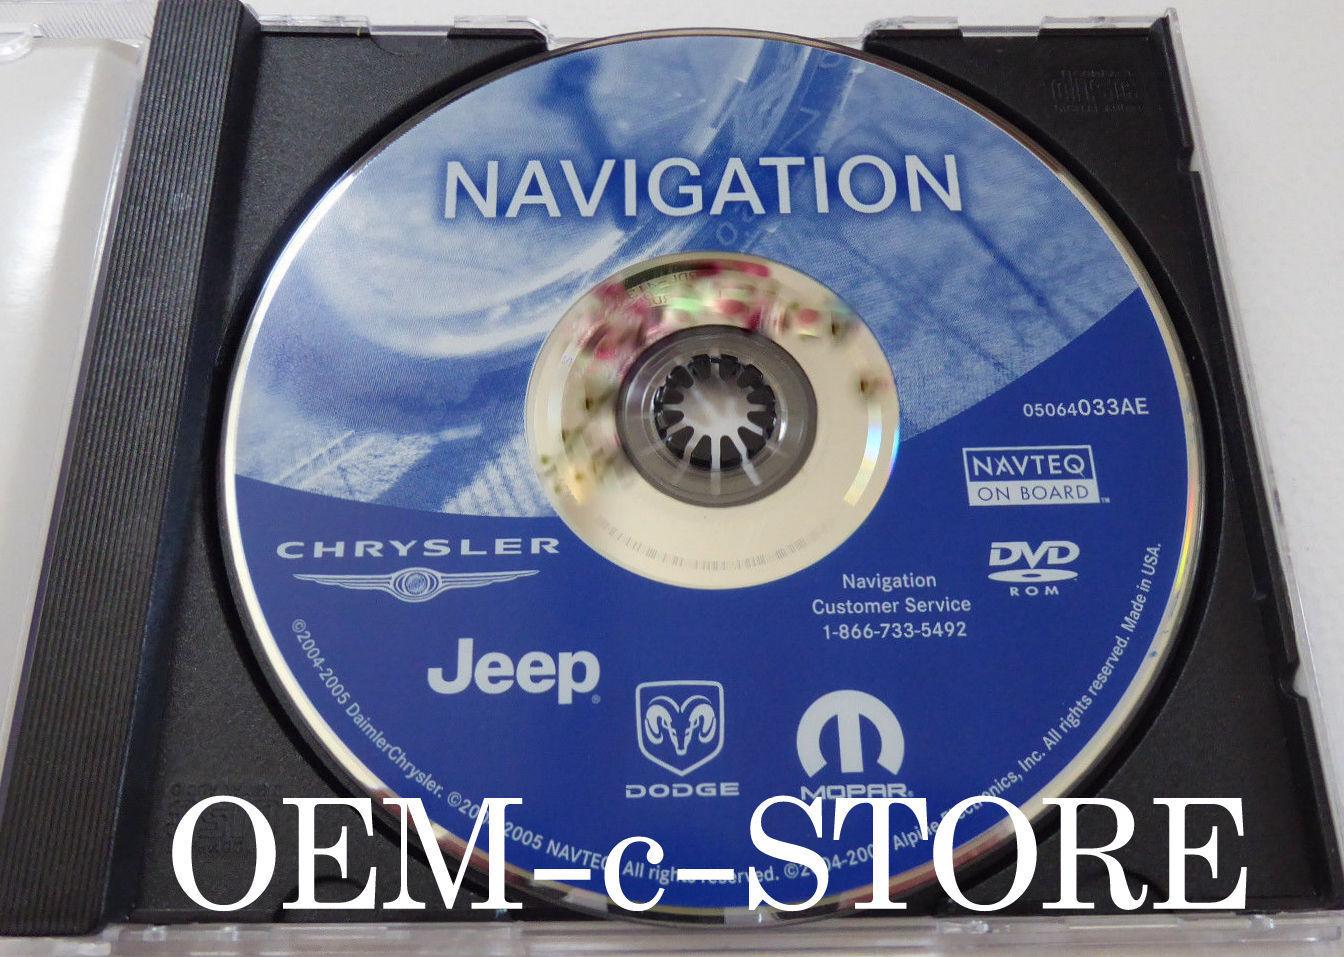 Only 2009 Dodge RAM Truck Heavy Duty 2500 3500 REC Navigation Radio DVD Map AE